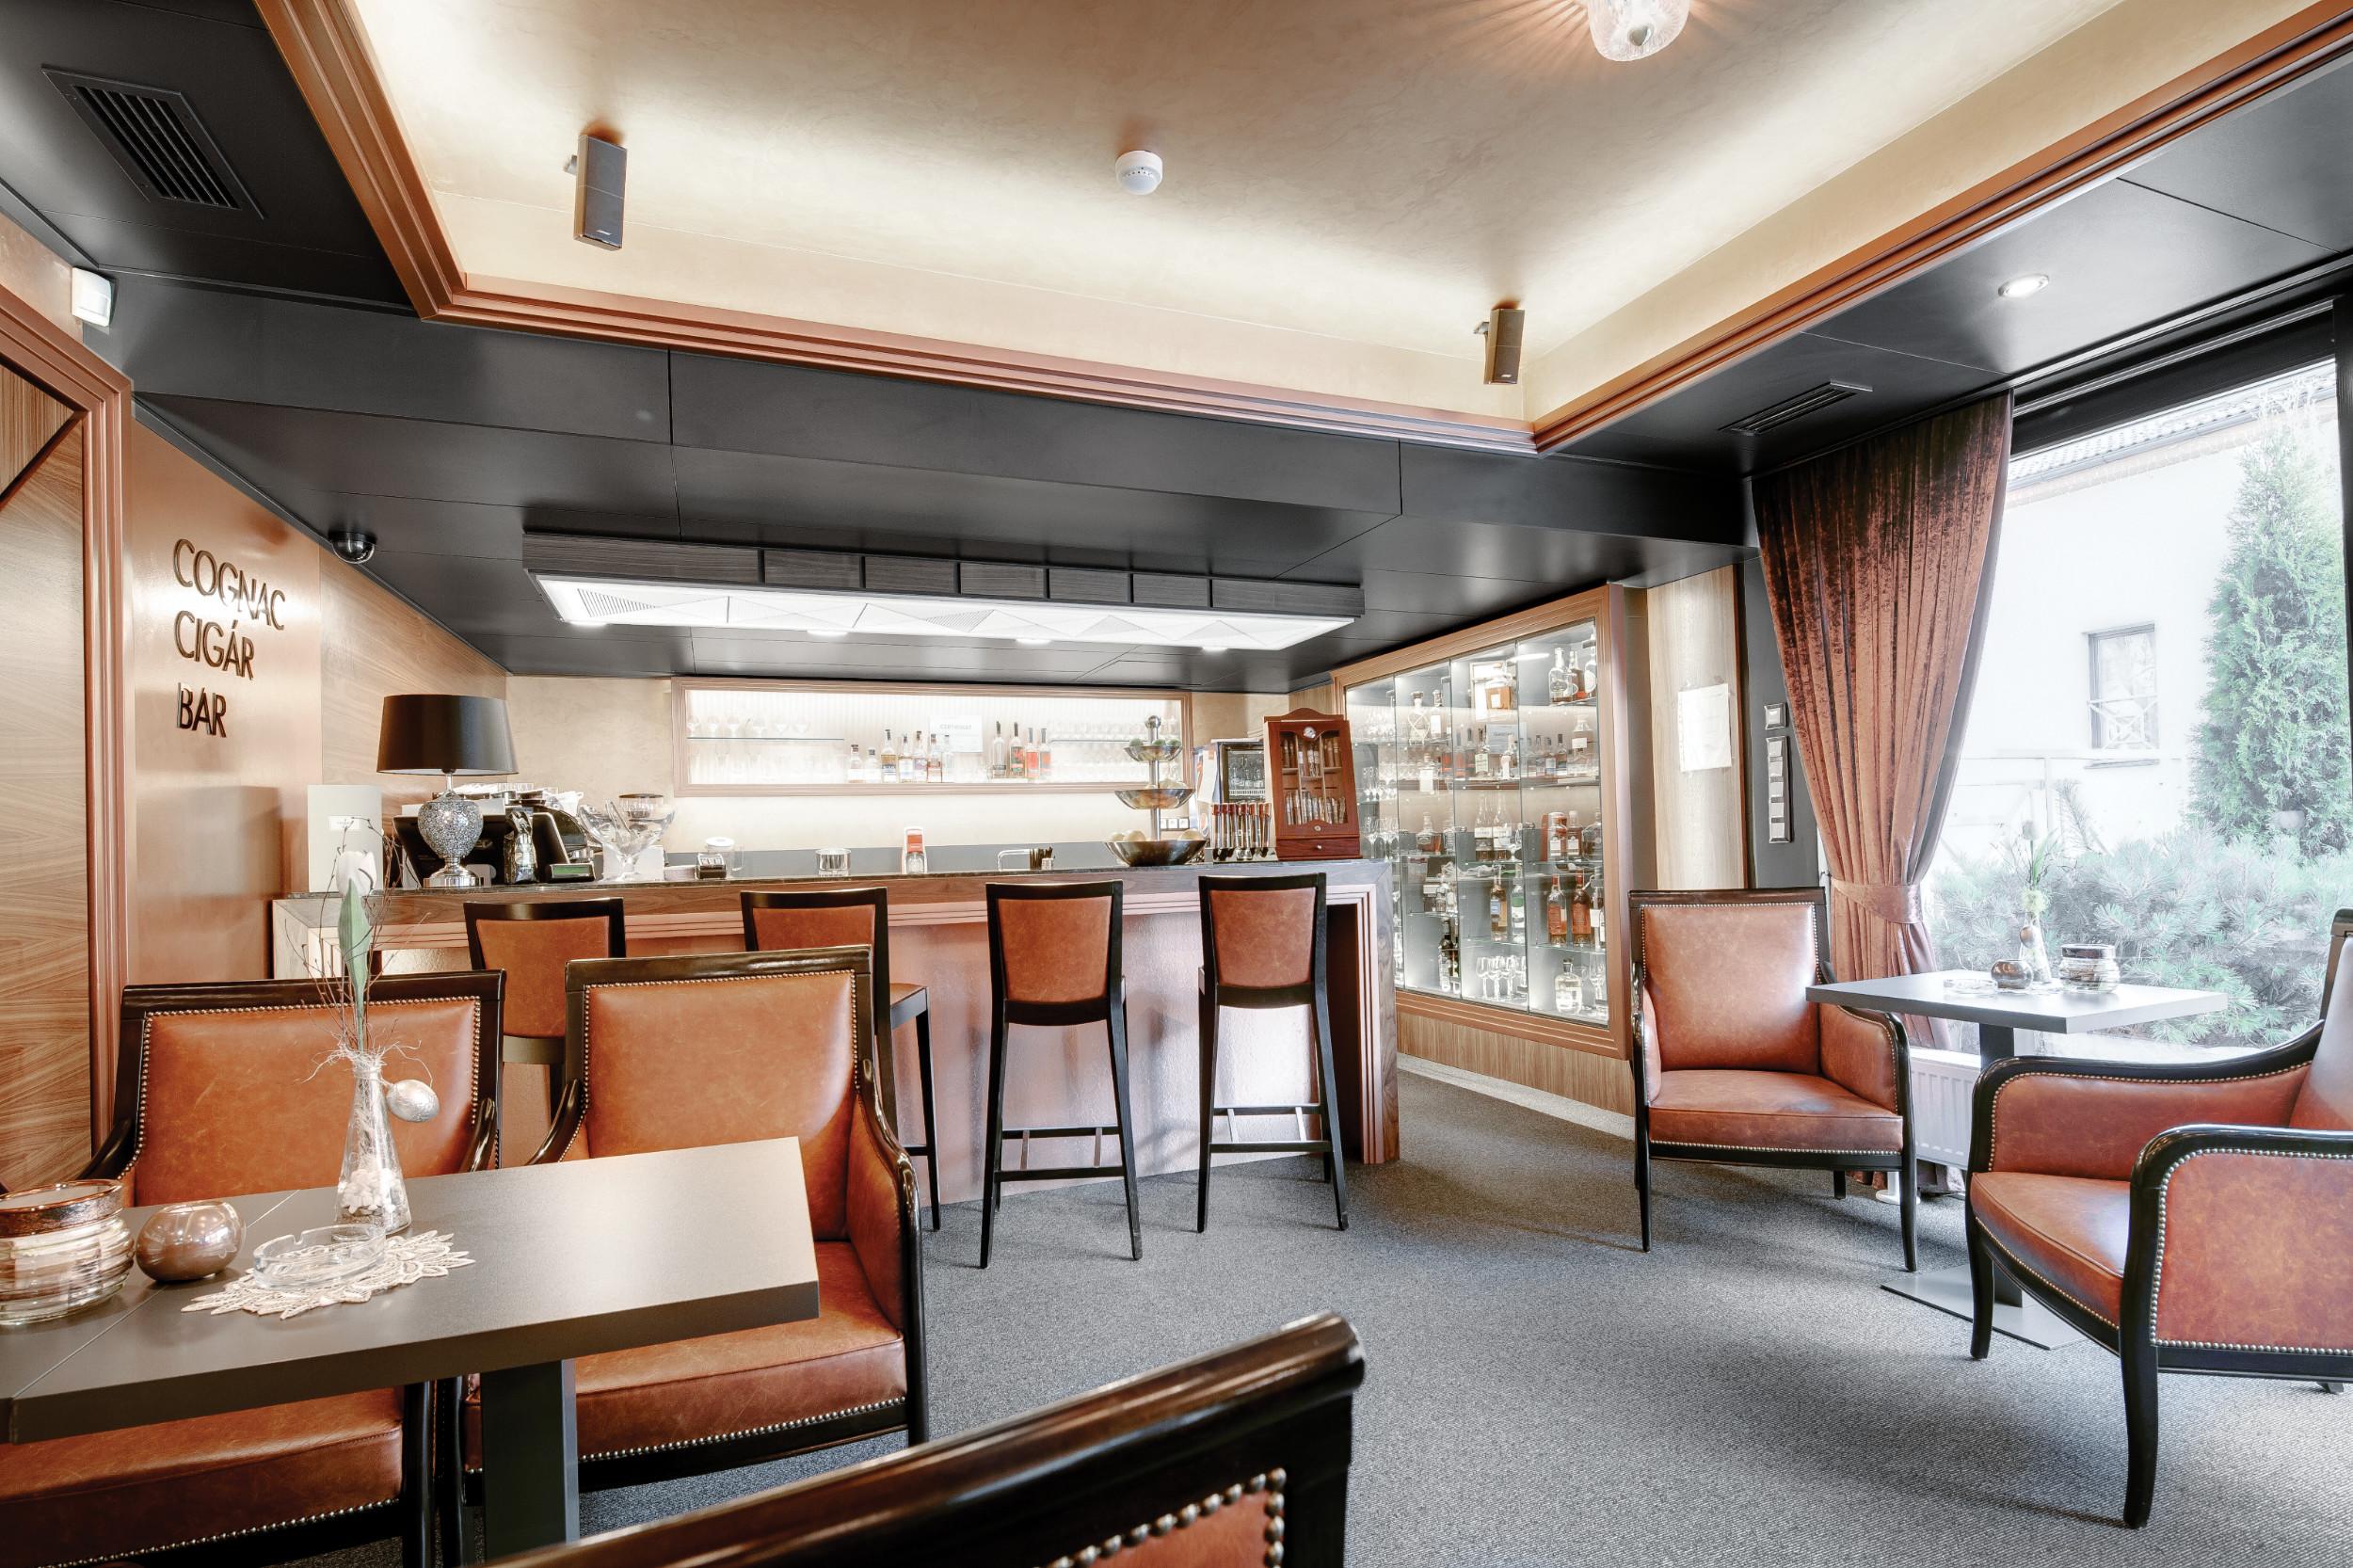 CigarBar Interior Zigarren Lounge